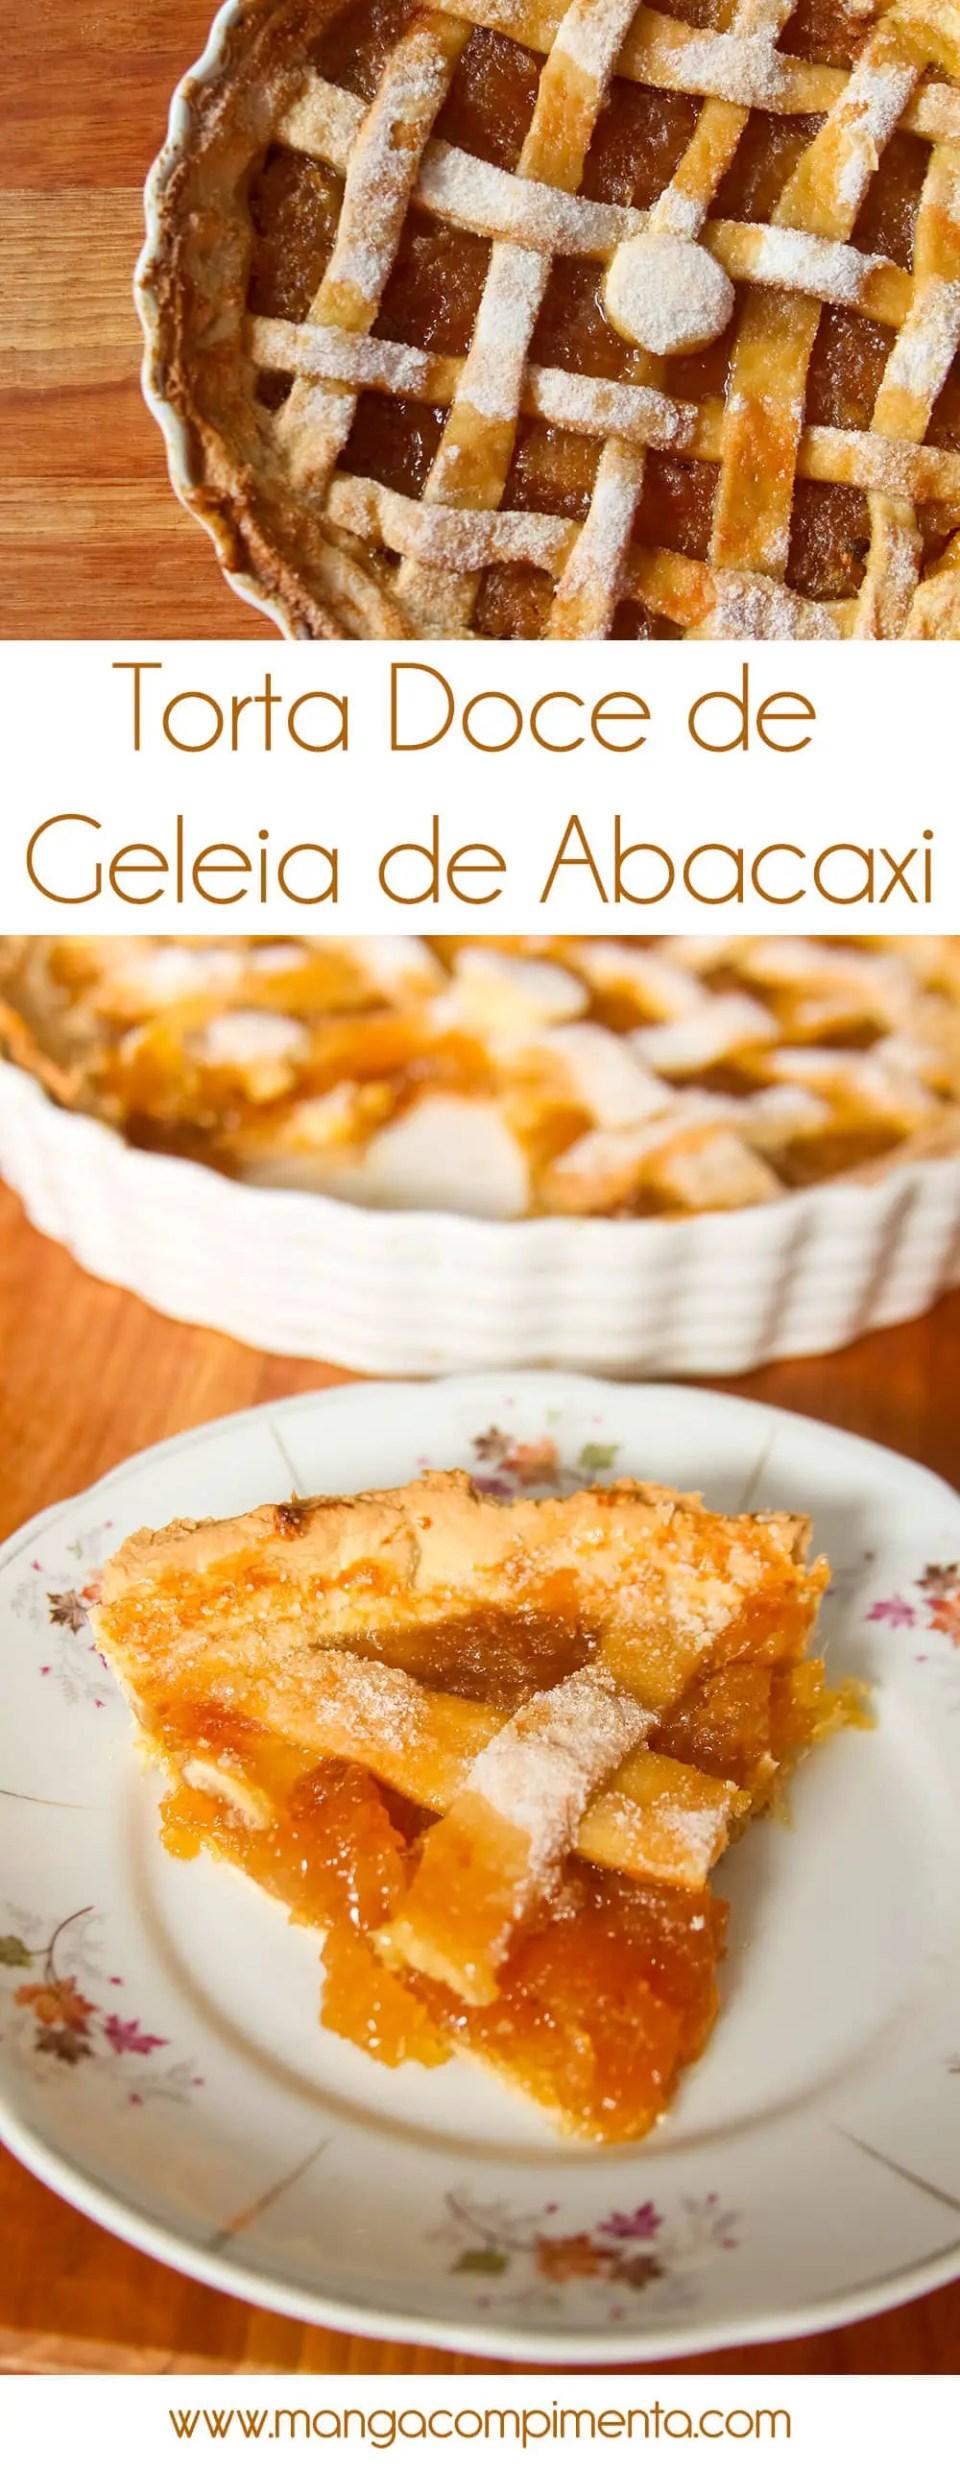 Torta Doce de Geleia de Abacaxi - Especial Ceia de Natal